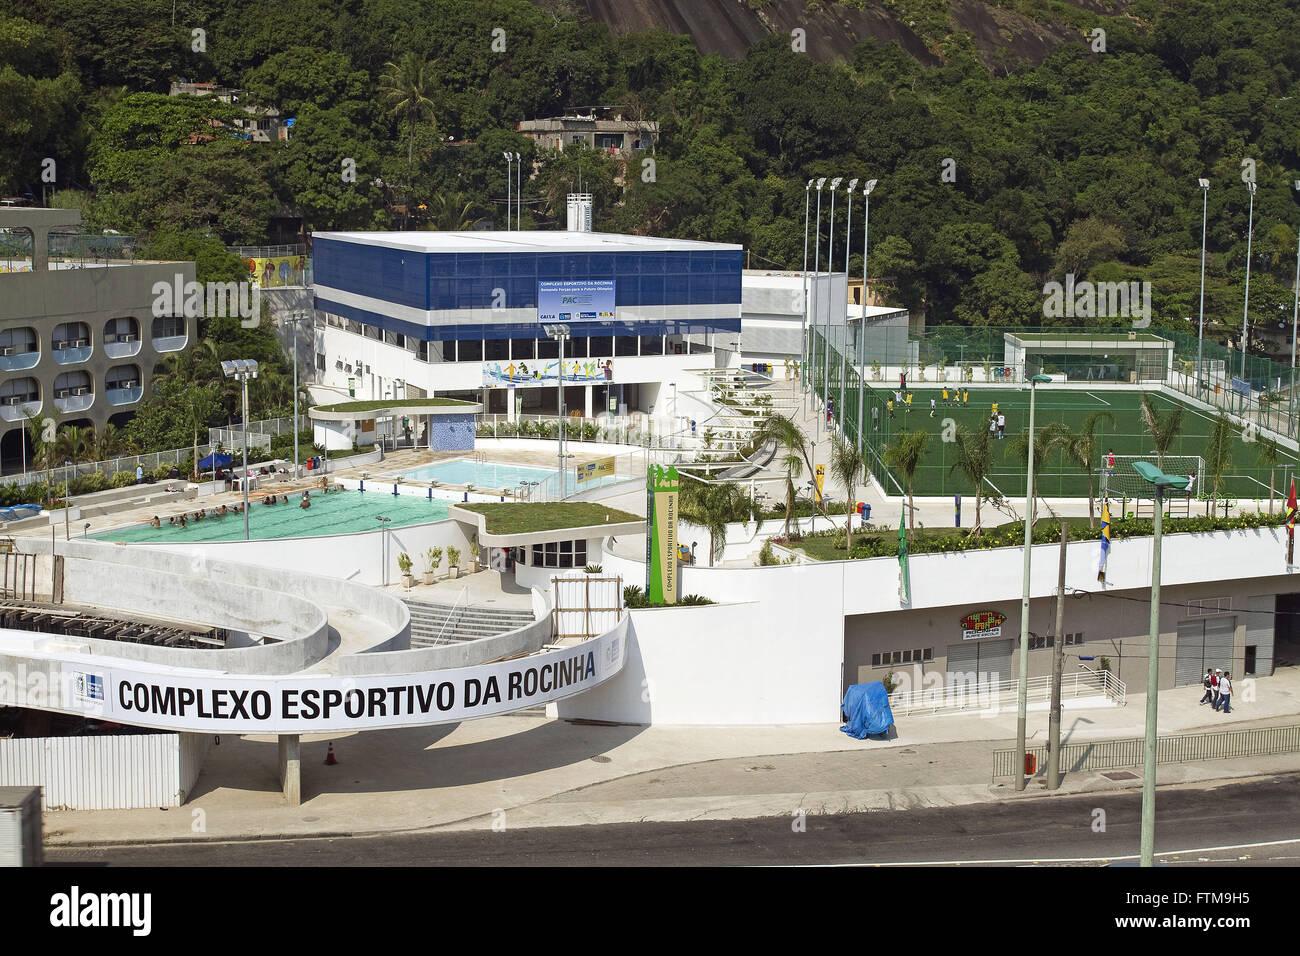 Rocinha Rio de Janeiro Sports Complex Photo Stock